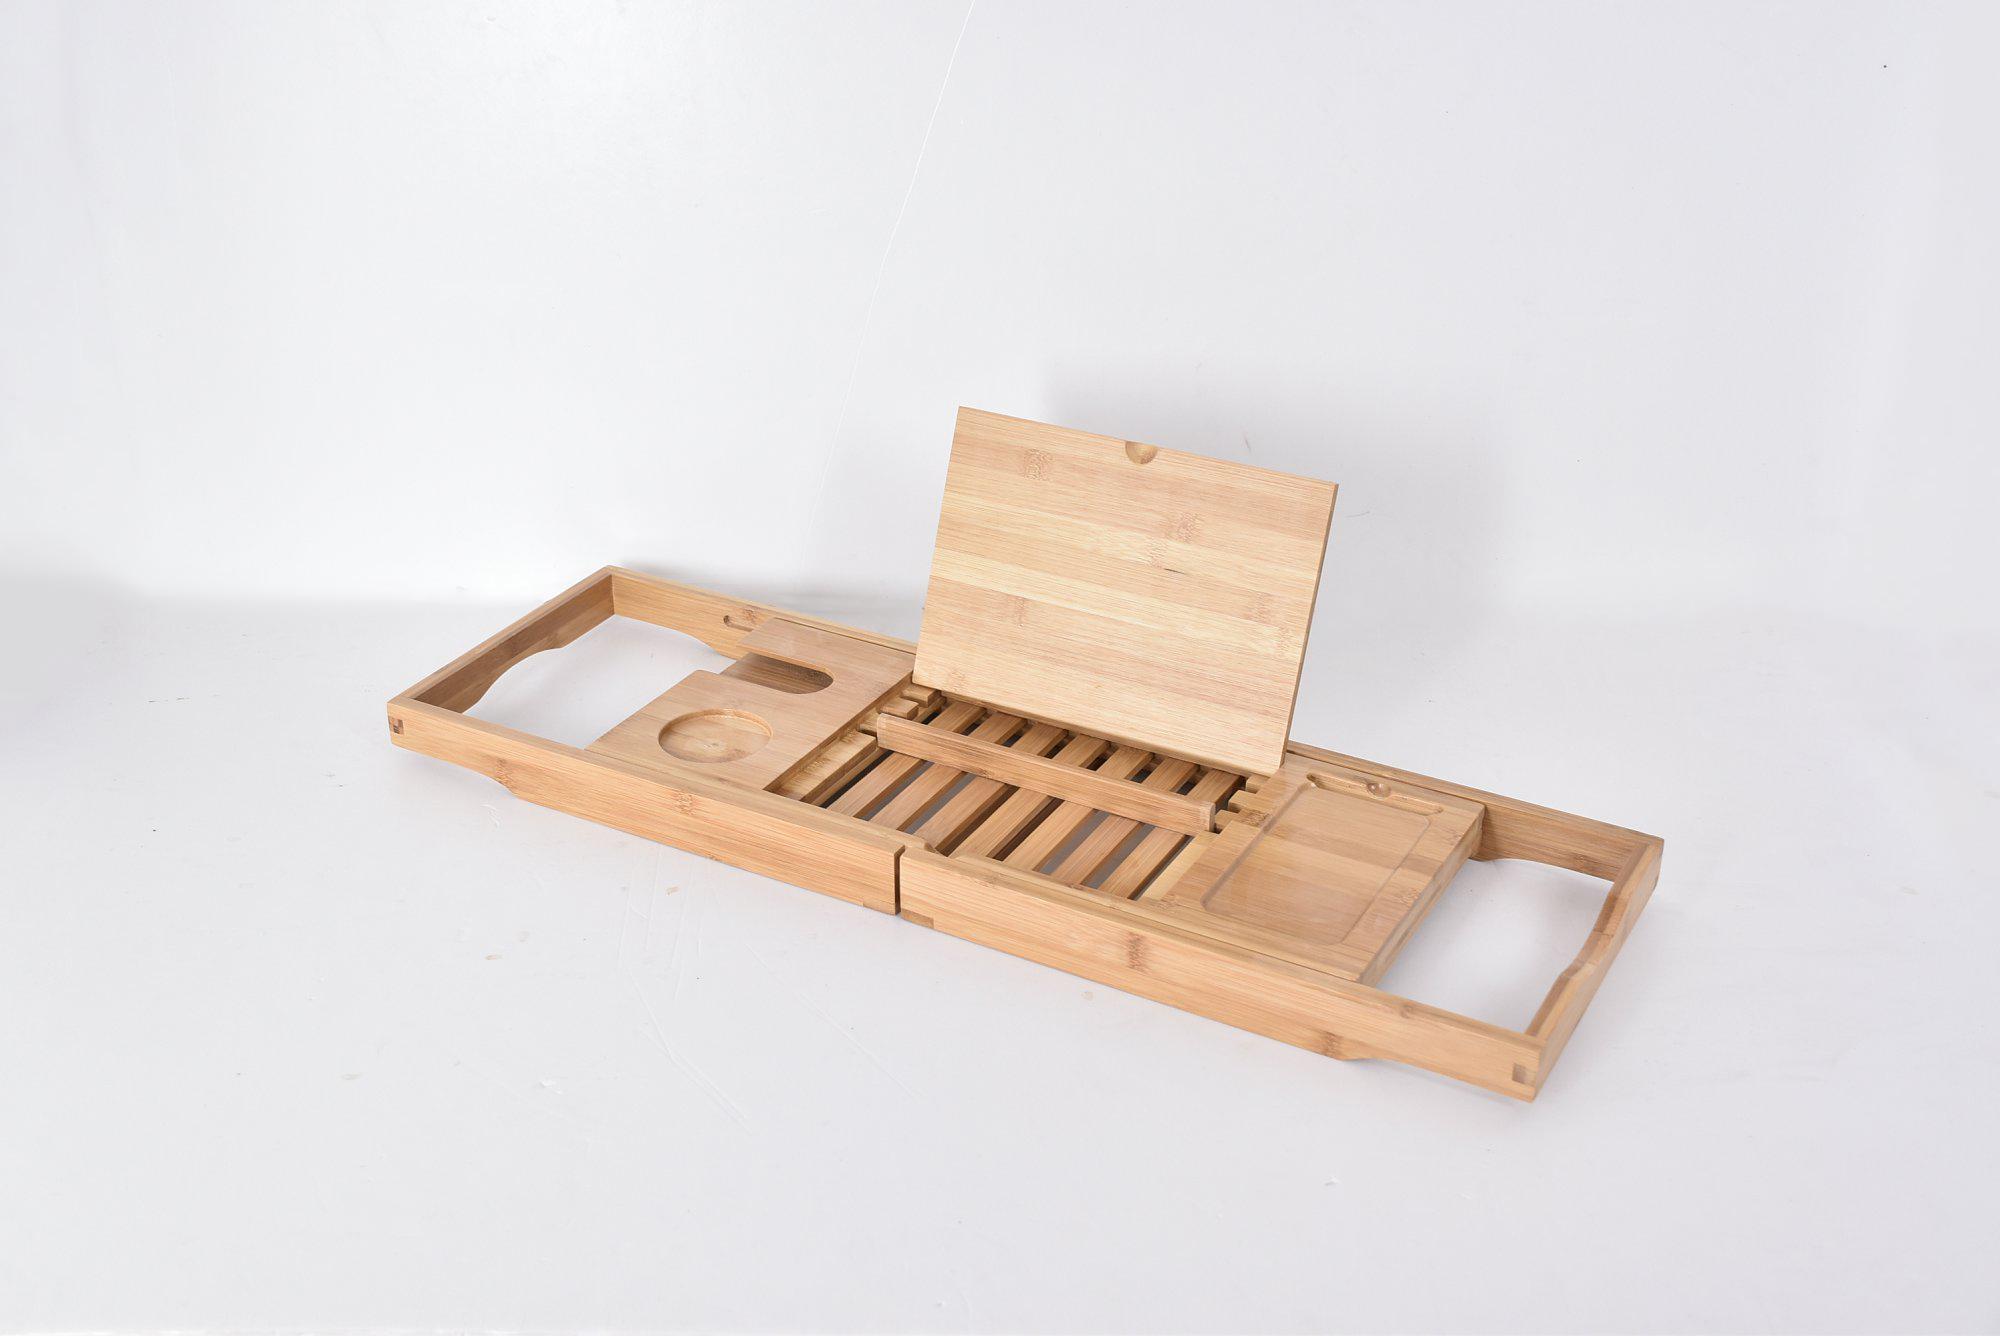 Bamboo wood bathtub caddy – Yi Bamboo| bamboo products